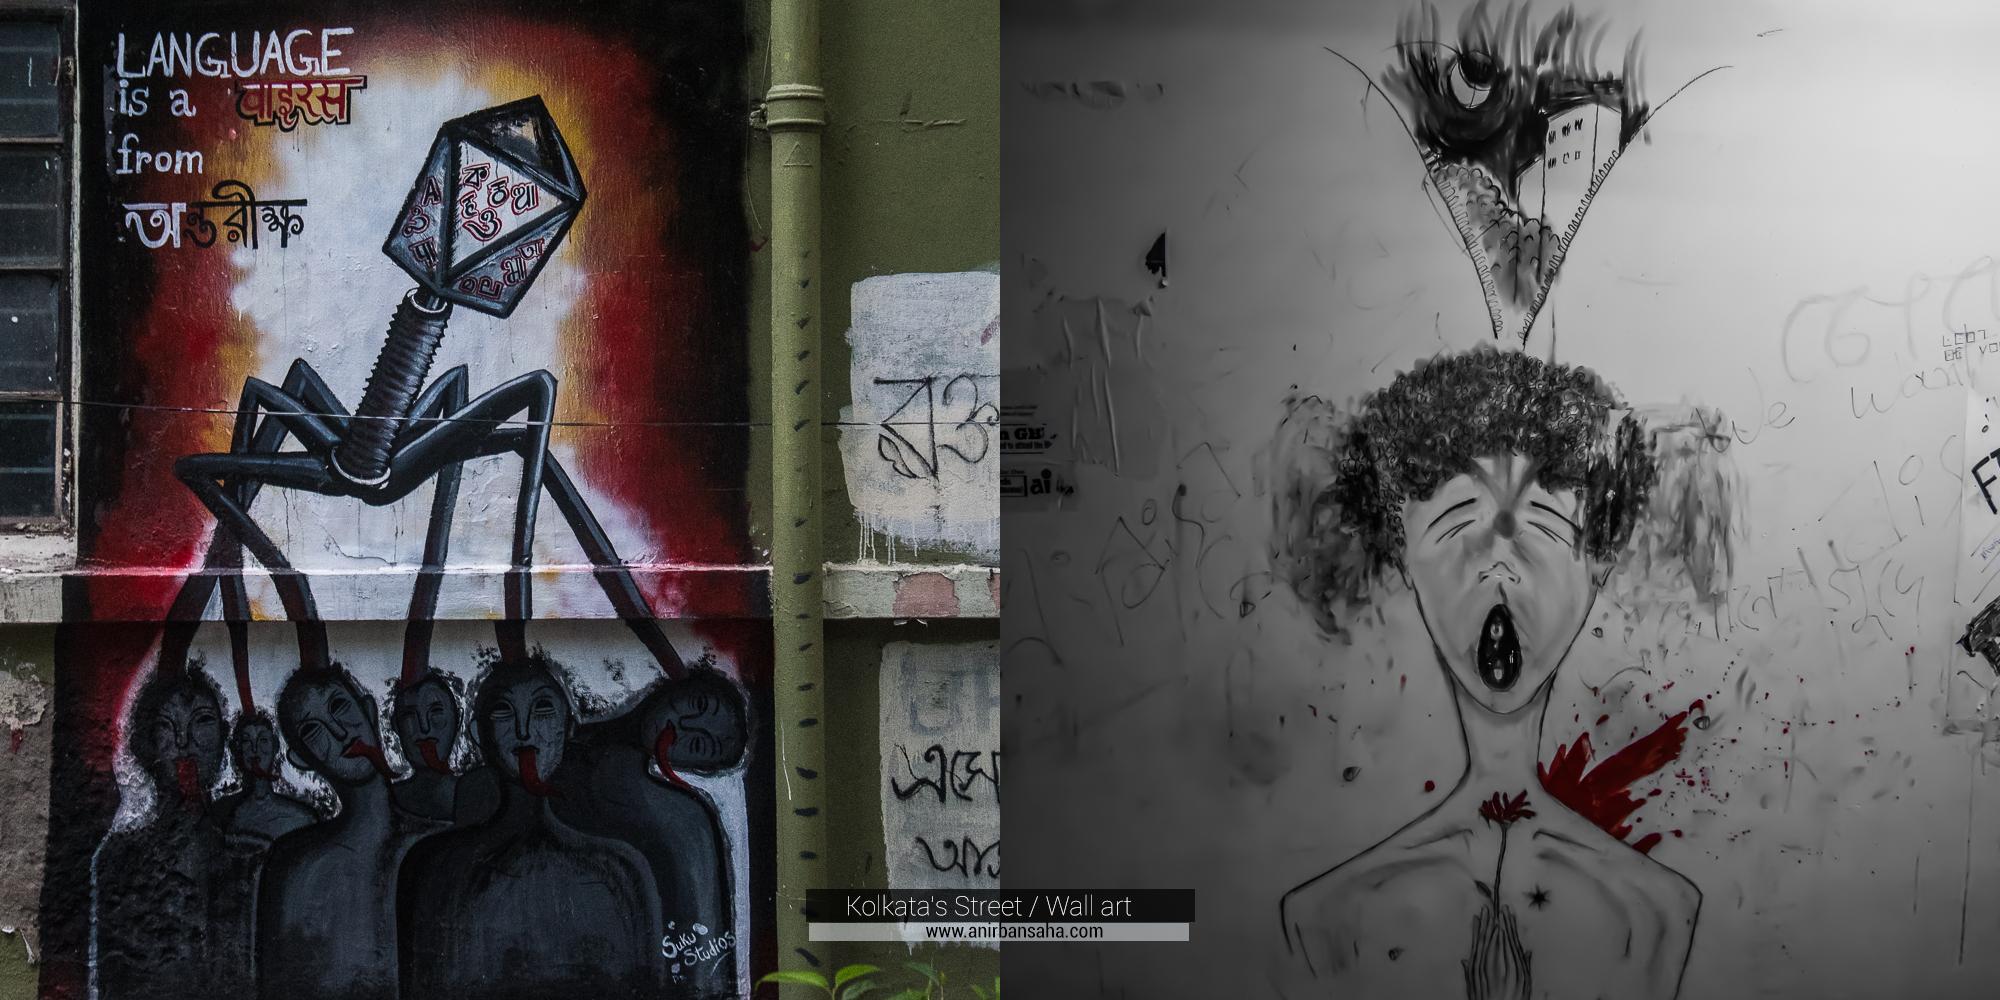 Kolkata Wall Art, Kolkata Graffiti, Kolkata Street Art Festival, Kolkata Street Art